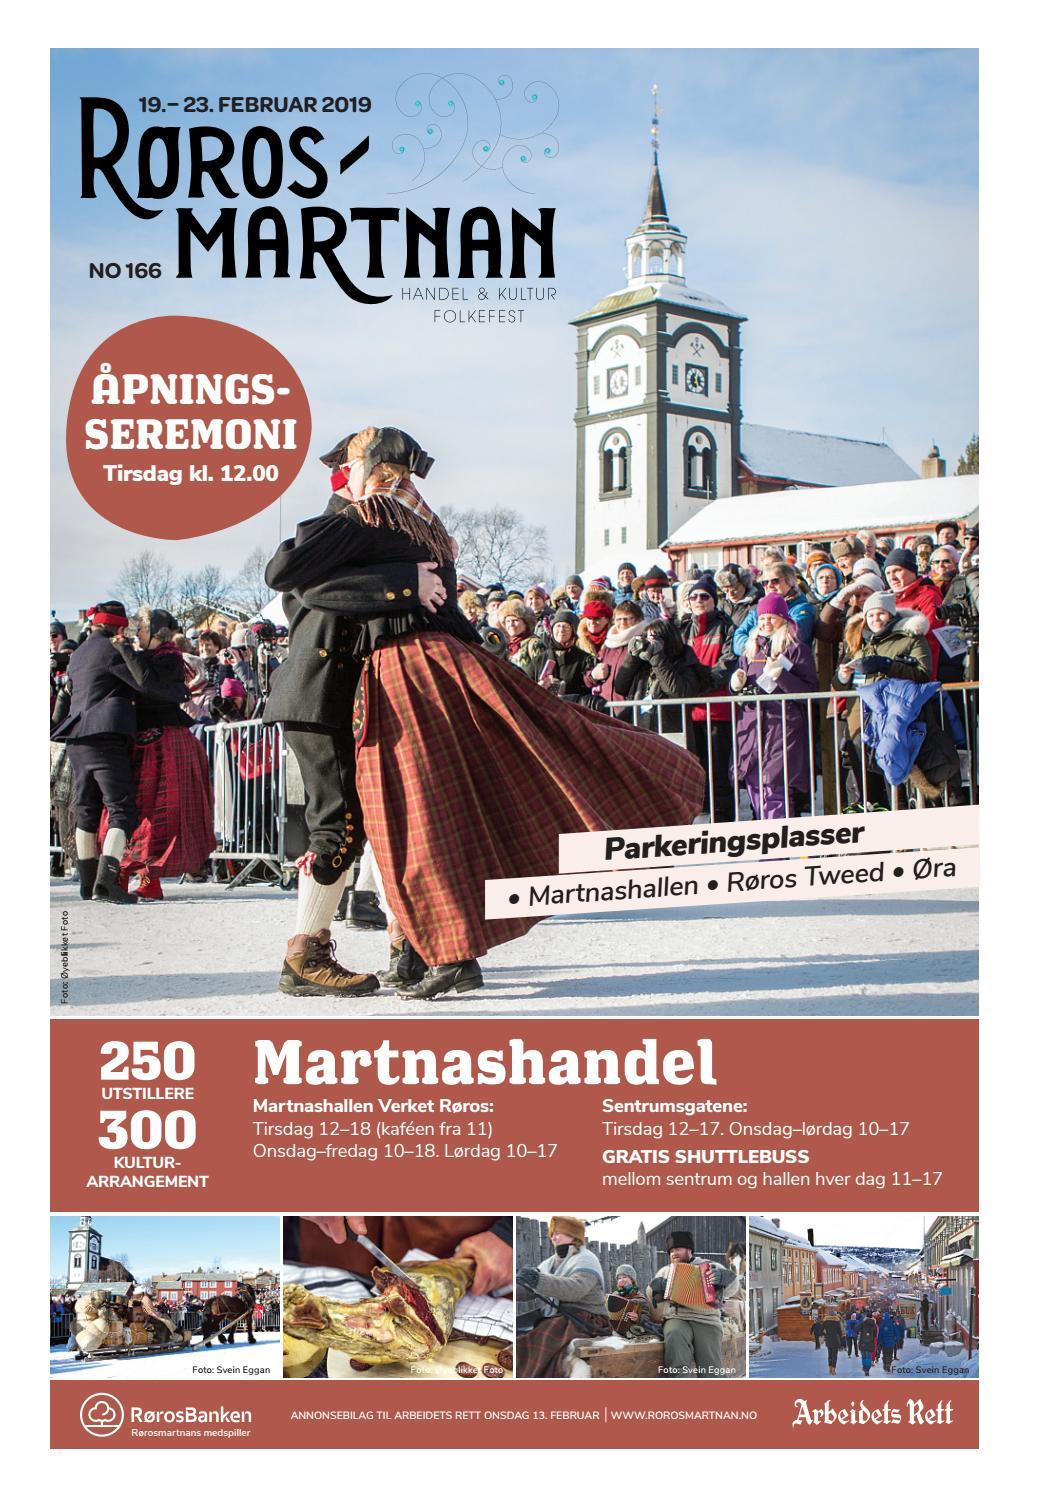 b0279f5d Rørosmartnan 2019 by Amedia Annonseproduksjon AS - issuu